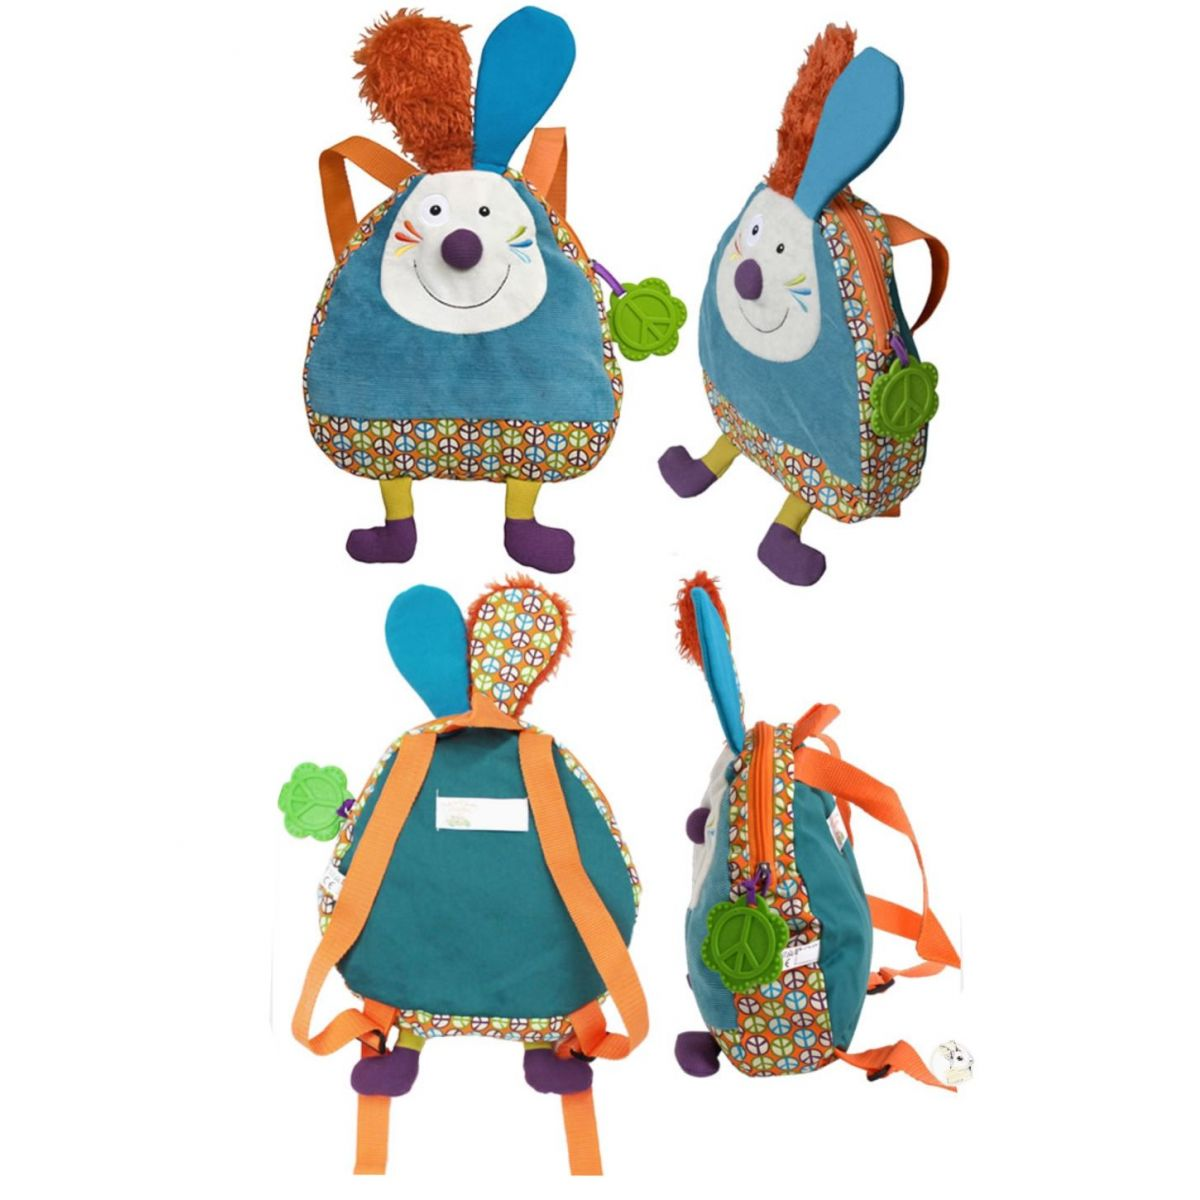 Mochila Infantil em Tecido Ebulobo - Happy Farm -  Jef